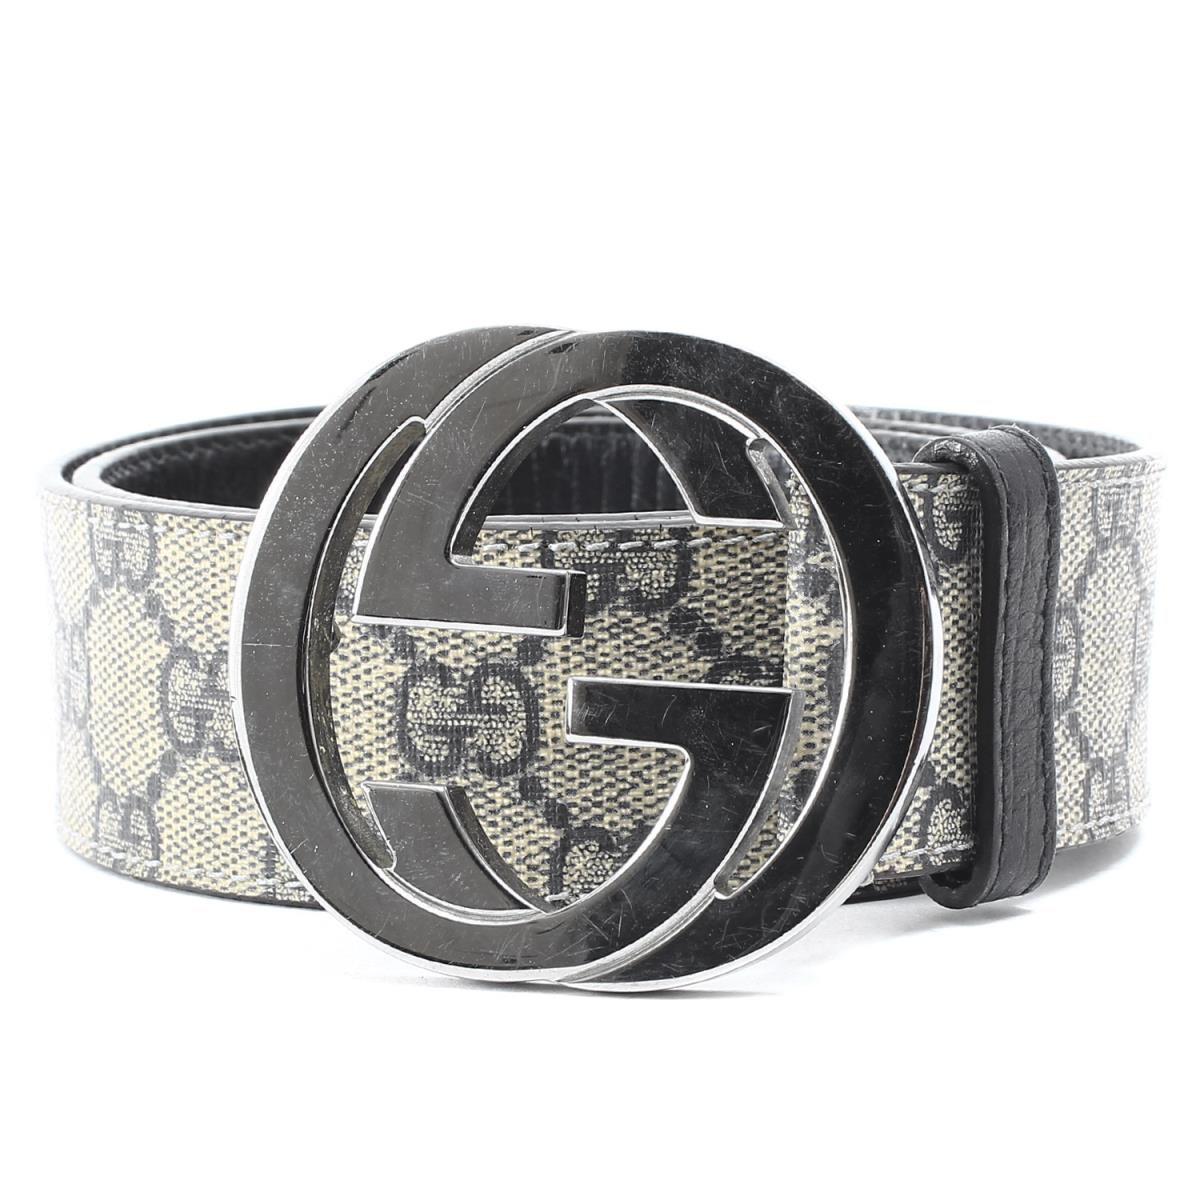 d31bf9c30 GUCCI (Gucci) GG buckle interlocking grip GG monogram belt (CINTURA GG  SUPREME) ...